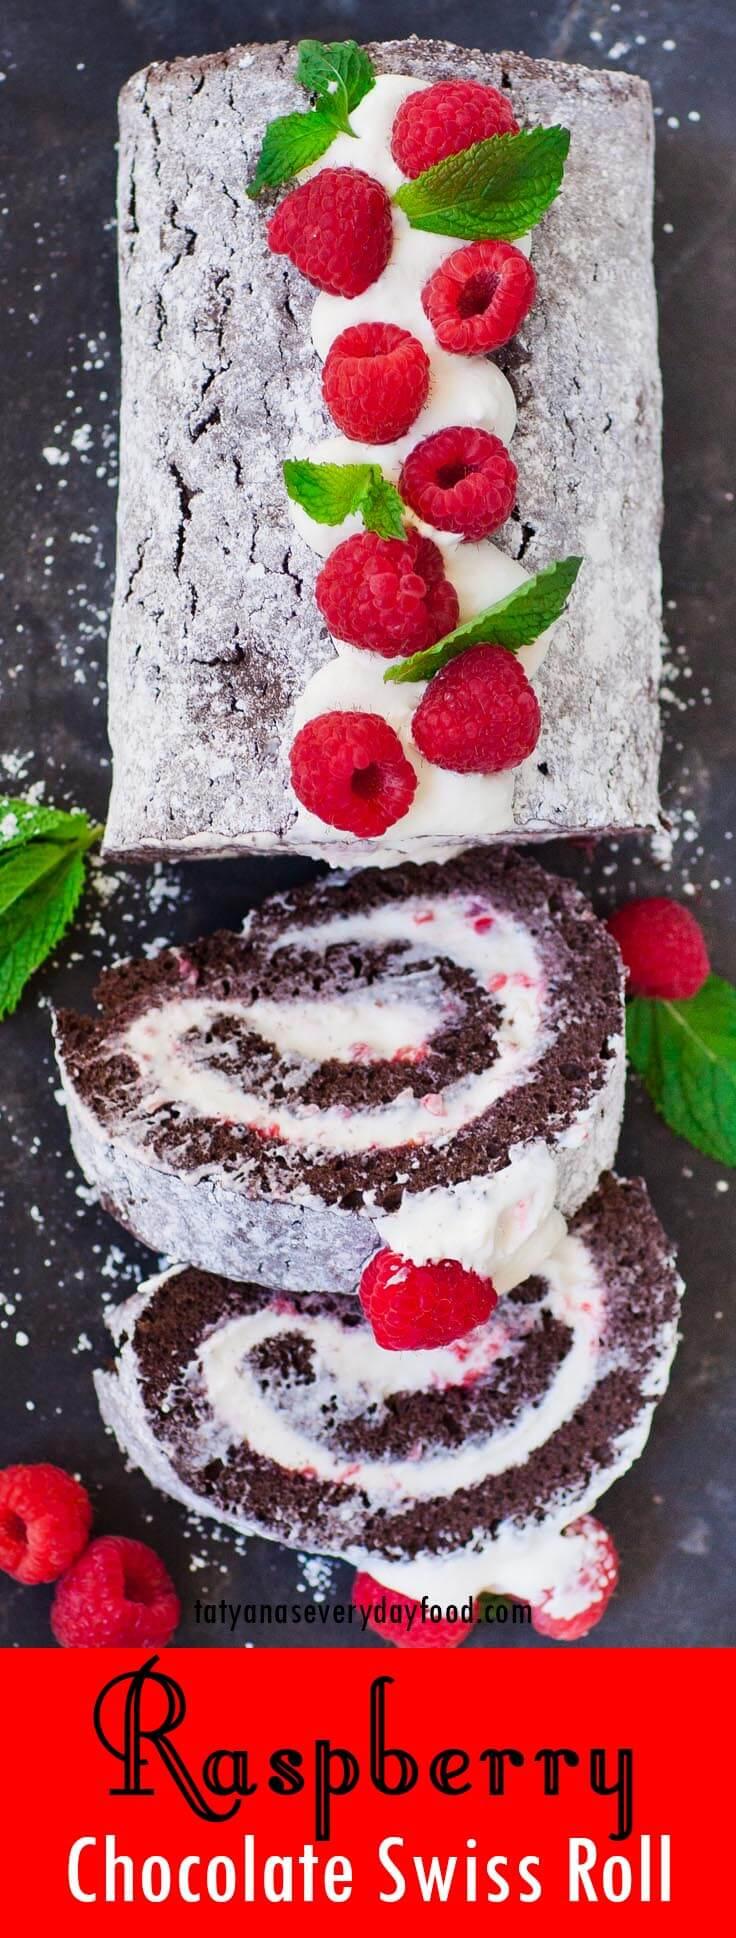 Chocolate Raspberry Swiss Roll video recipe